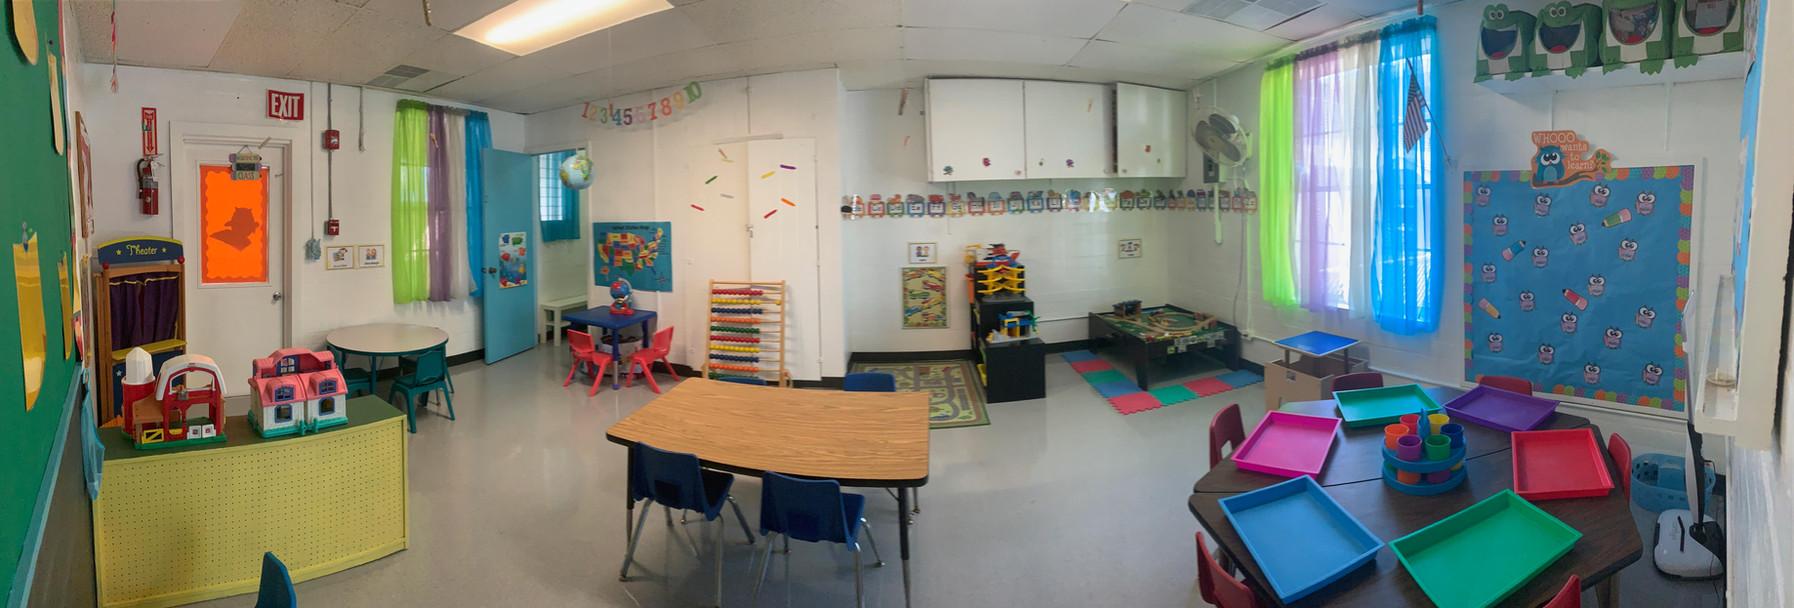 Green Room Preschool Classroom